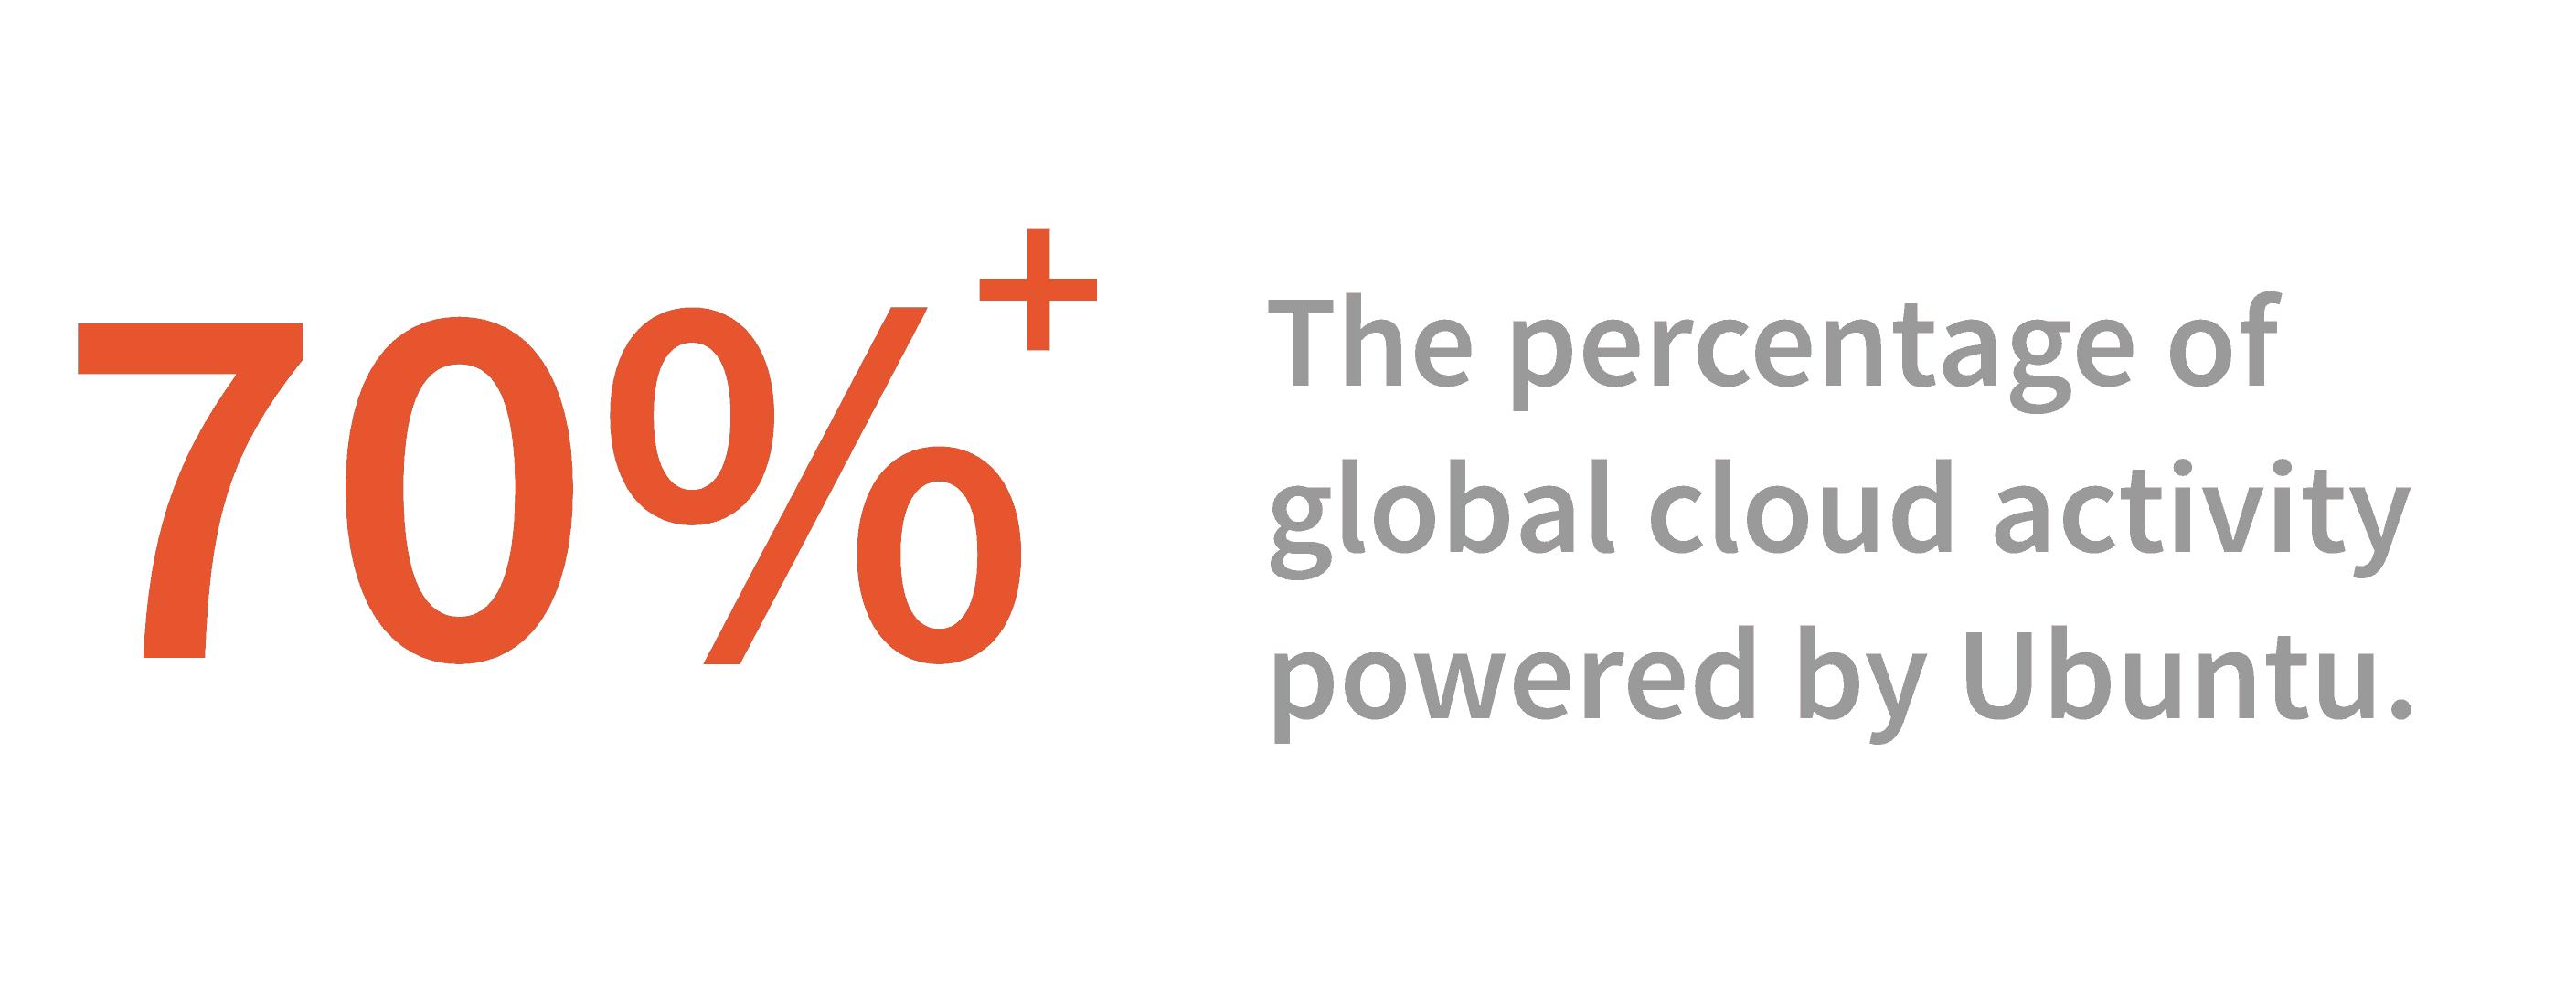 ubuntu cloud market share